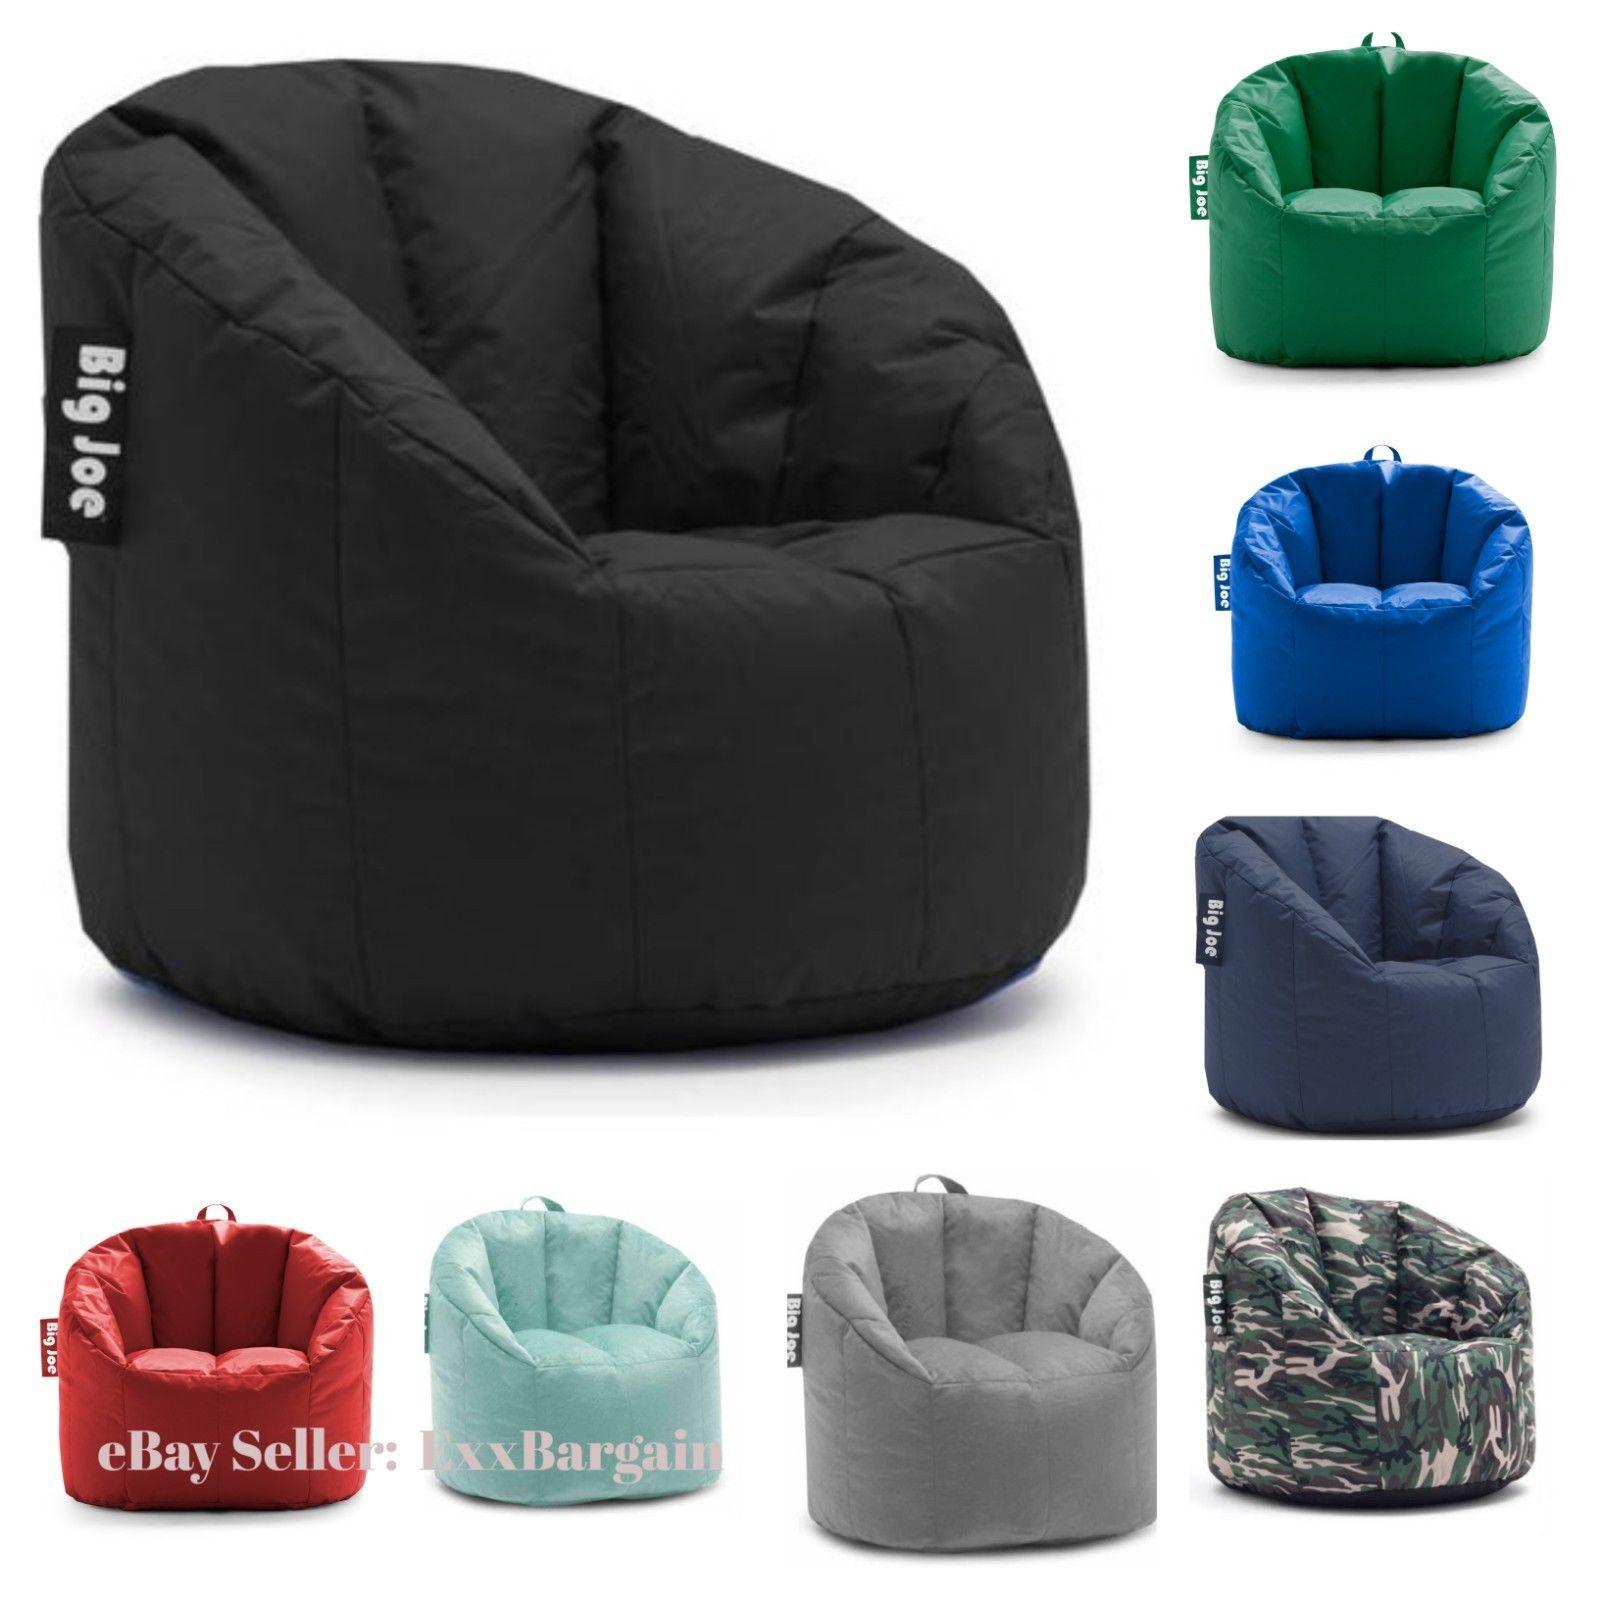 Pleasing Bean Bags And Inflatables 48319 Big Joe Milano Bean Bag Ibusinesslaw Wood Chair Design Ideas Ibusinesslaworg